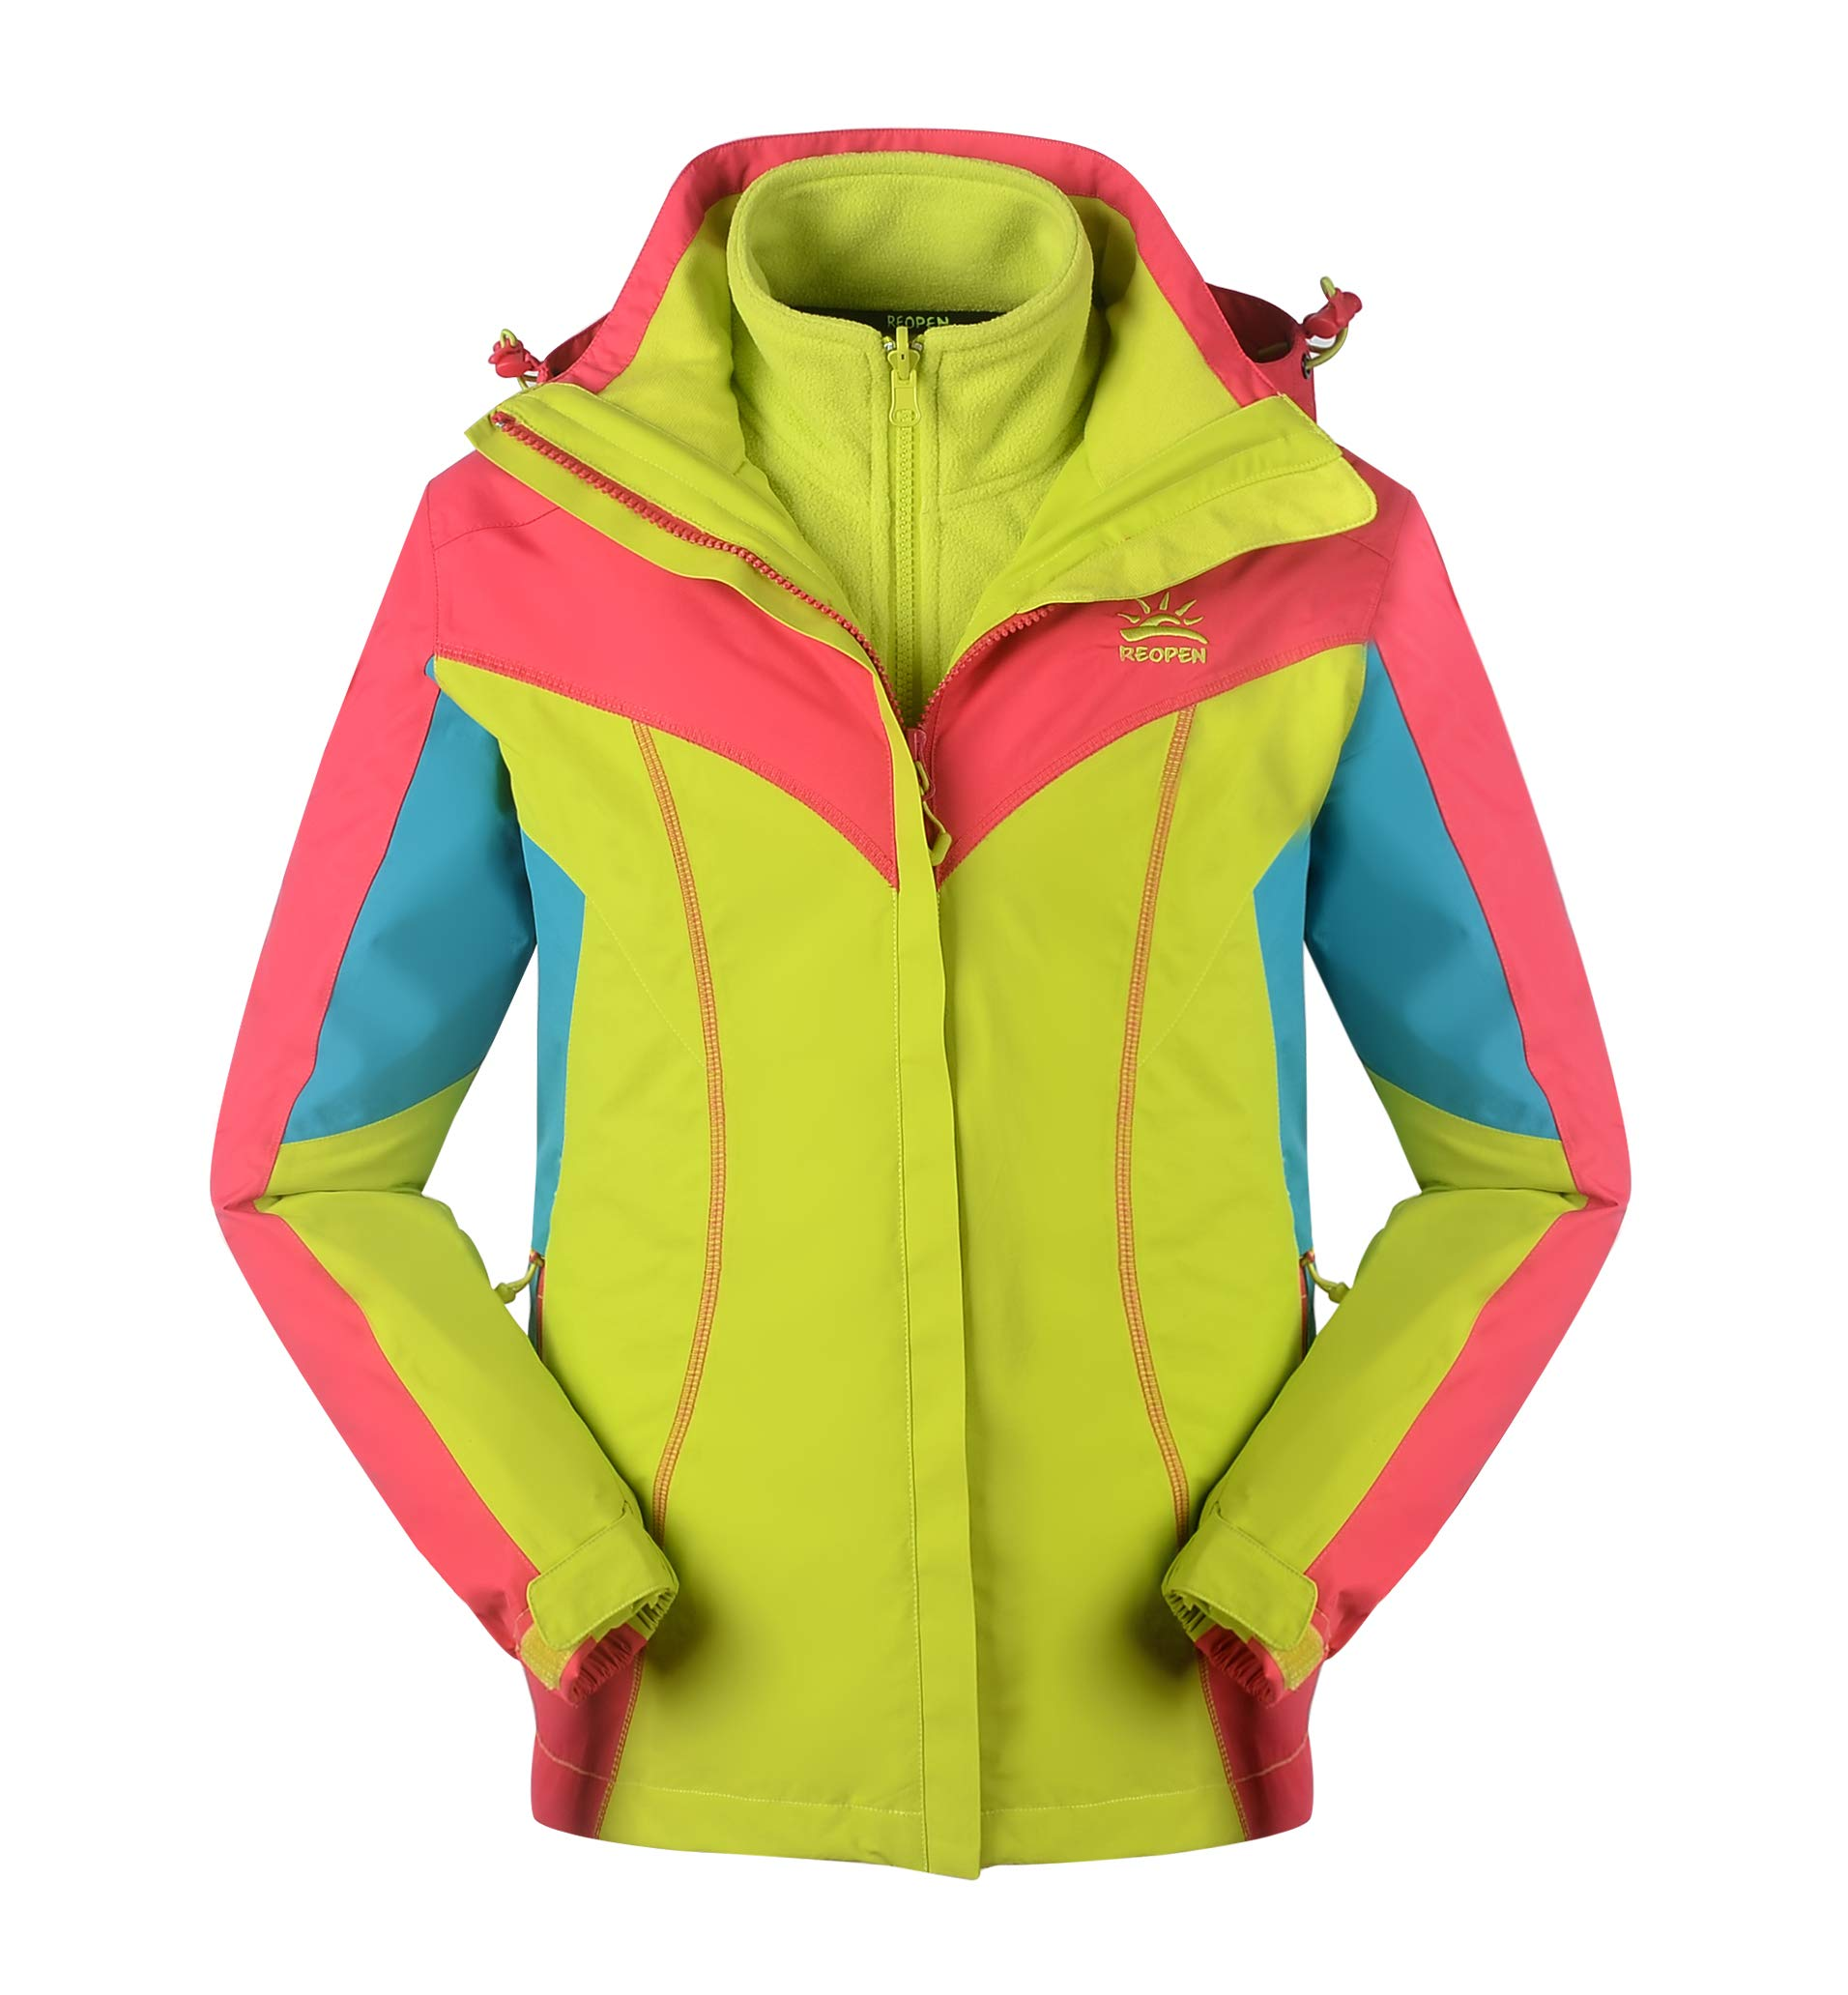 Reopen Girl's Outdoor 3 in 1 Sports Jacket Mountain Waterproof Ski Jacket with Inner Detachable Fleece Coat and Detachable Hat (120/56A, Blue)